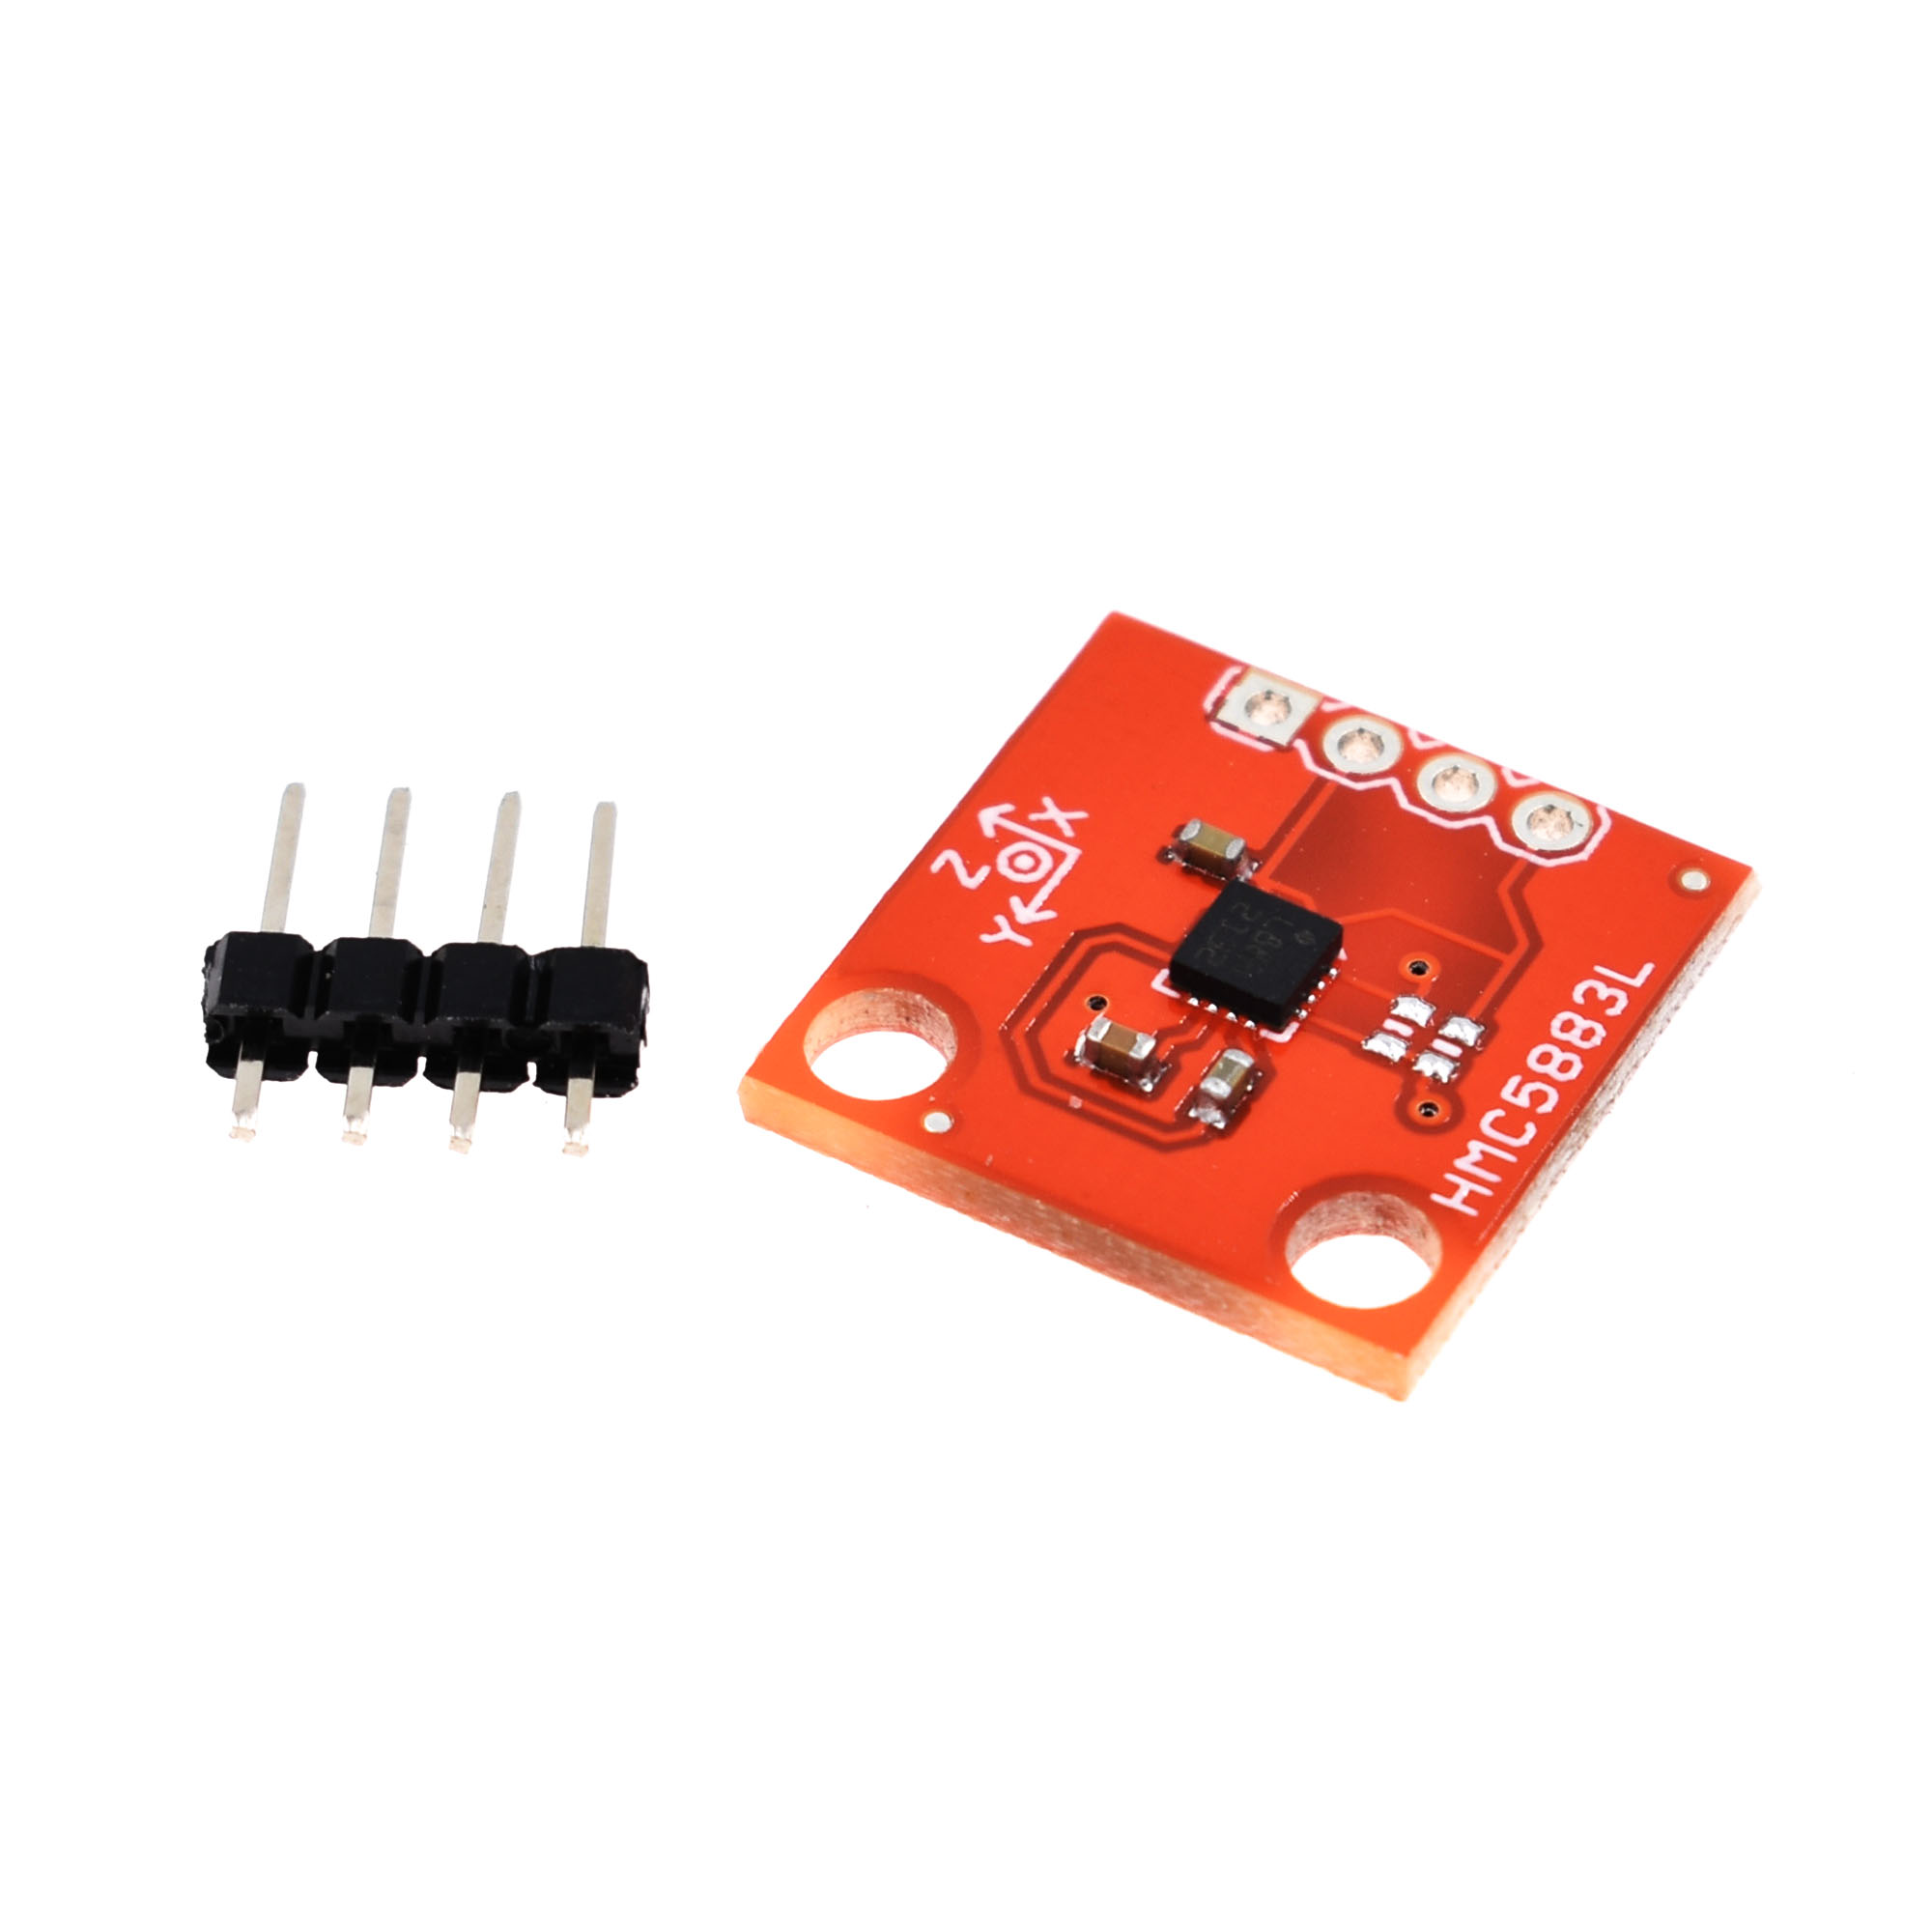 Details about Triple Axis HMC5883L GY-271 GY-273 Compass Magnetomet Sensor  3V-5V Arduino US